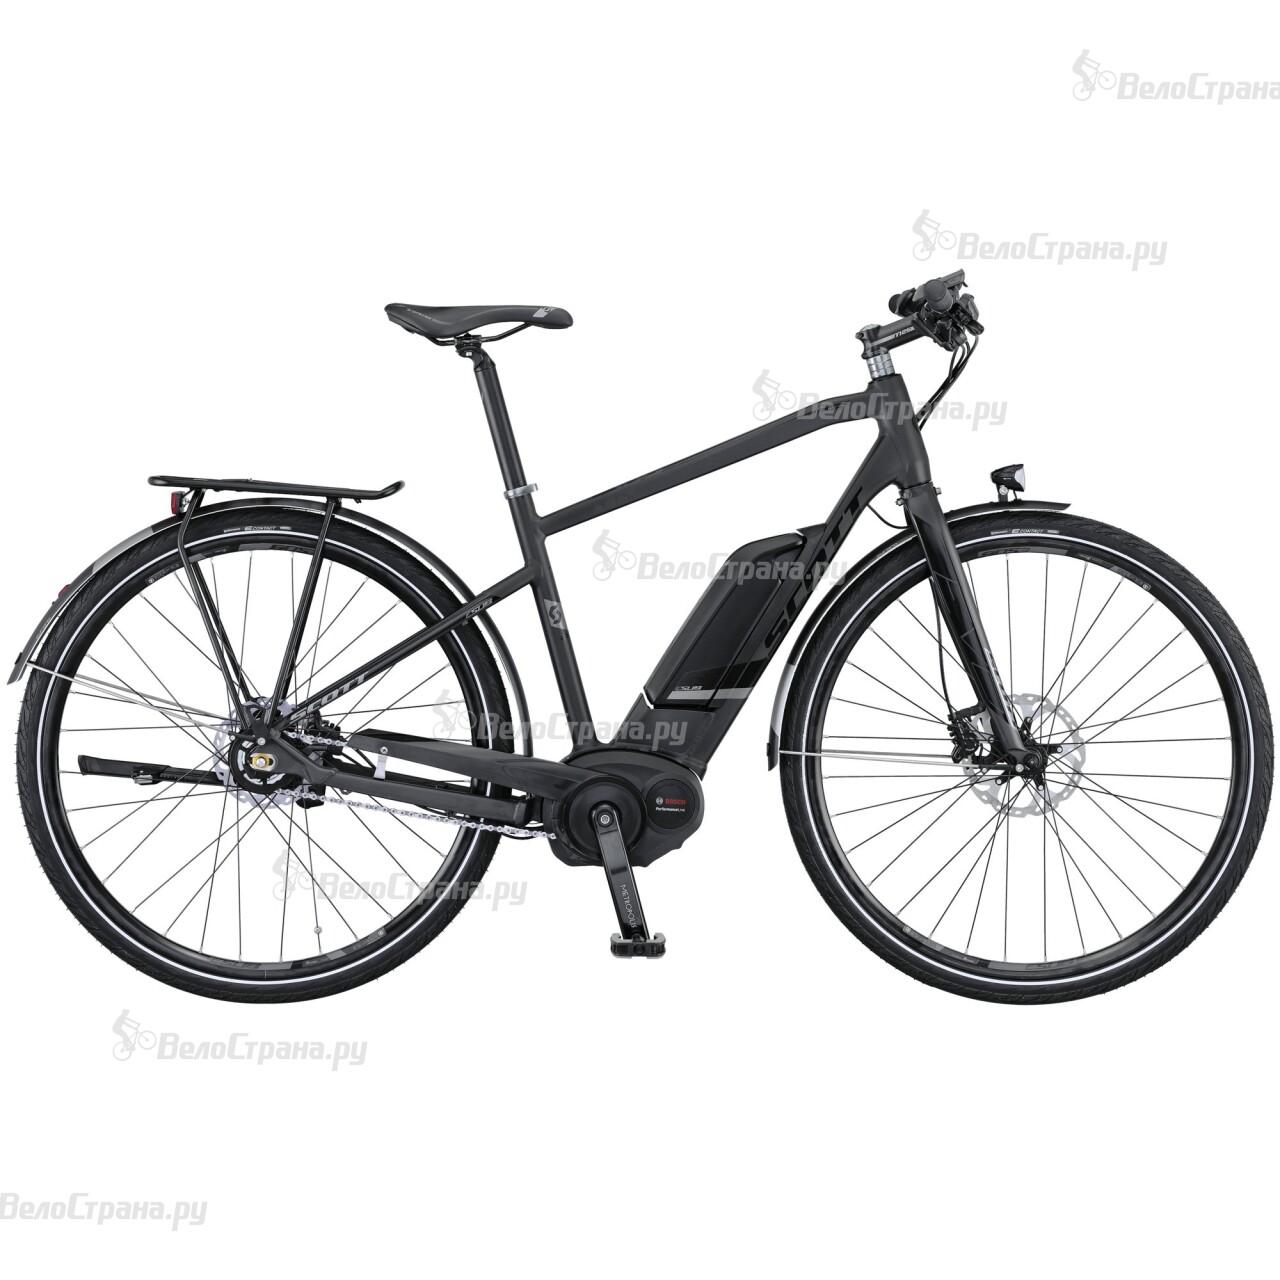 Велосипед Scott E-Sub Evo (2016) велосипед scott e silence evo 2017